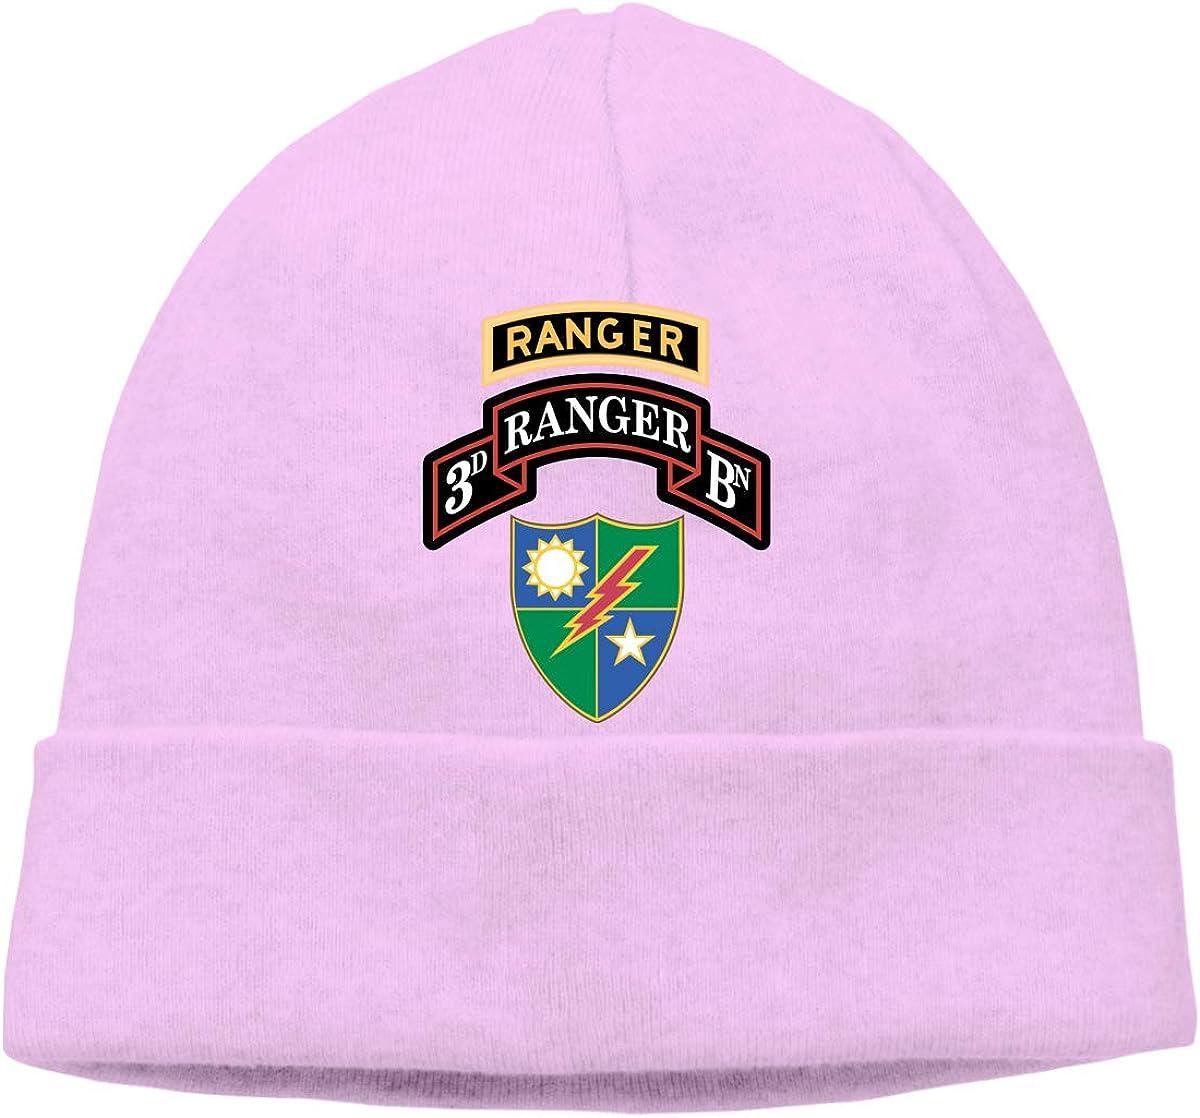 75th Ranger Regiment with Ranger Unisex Knitted Beanie Beanie Hat Skull Cap Knit Hat CHUANtaotou 3rd Battalion